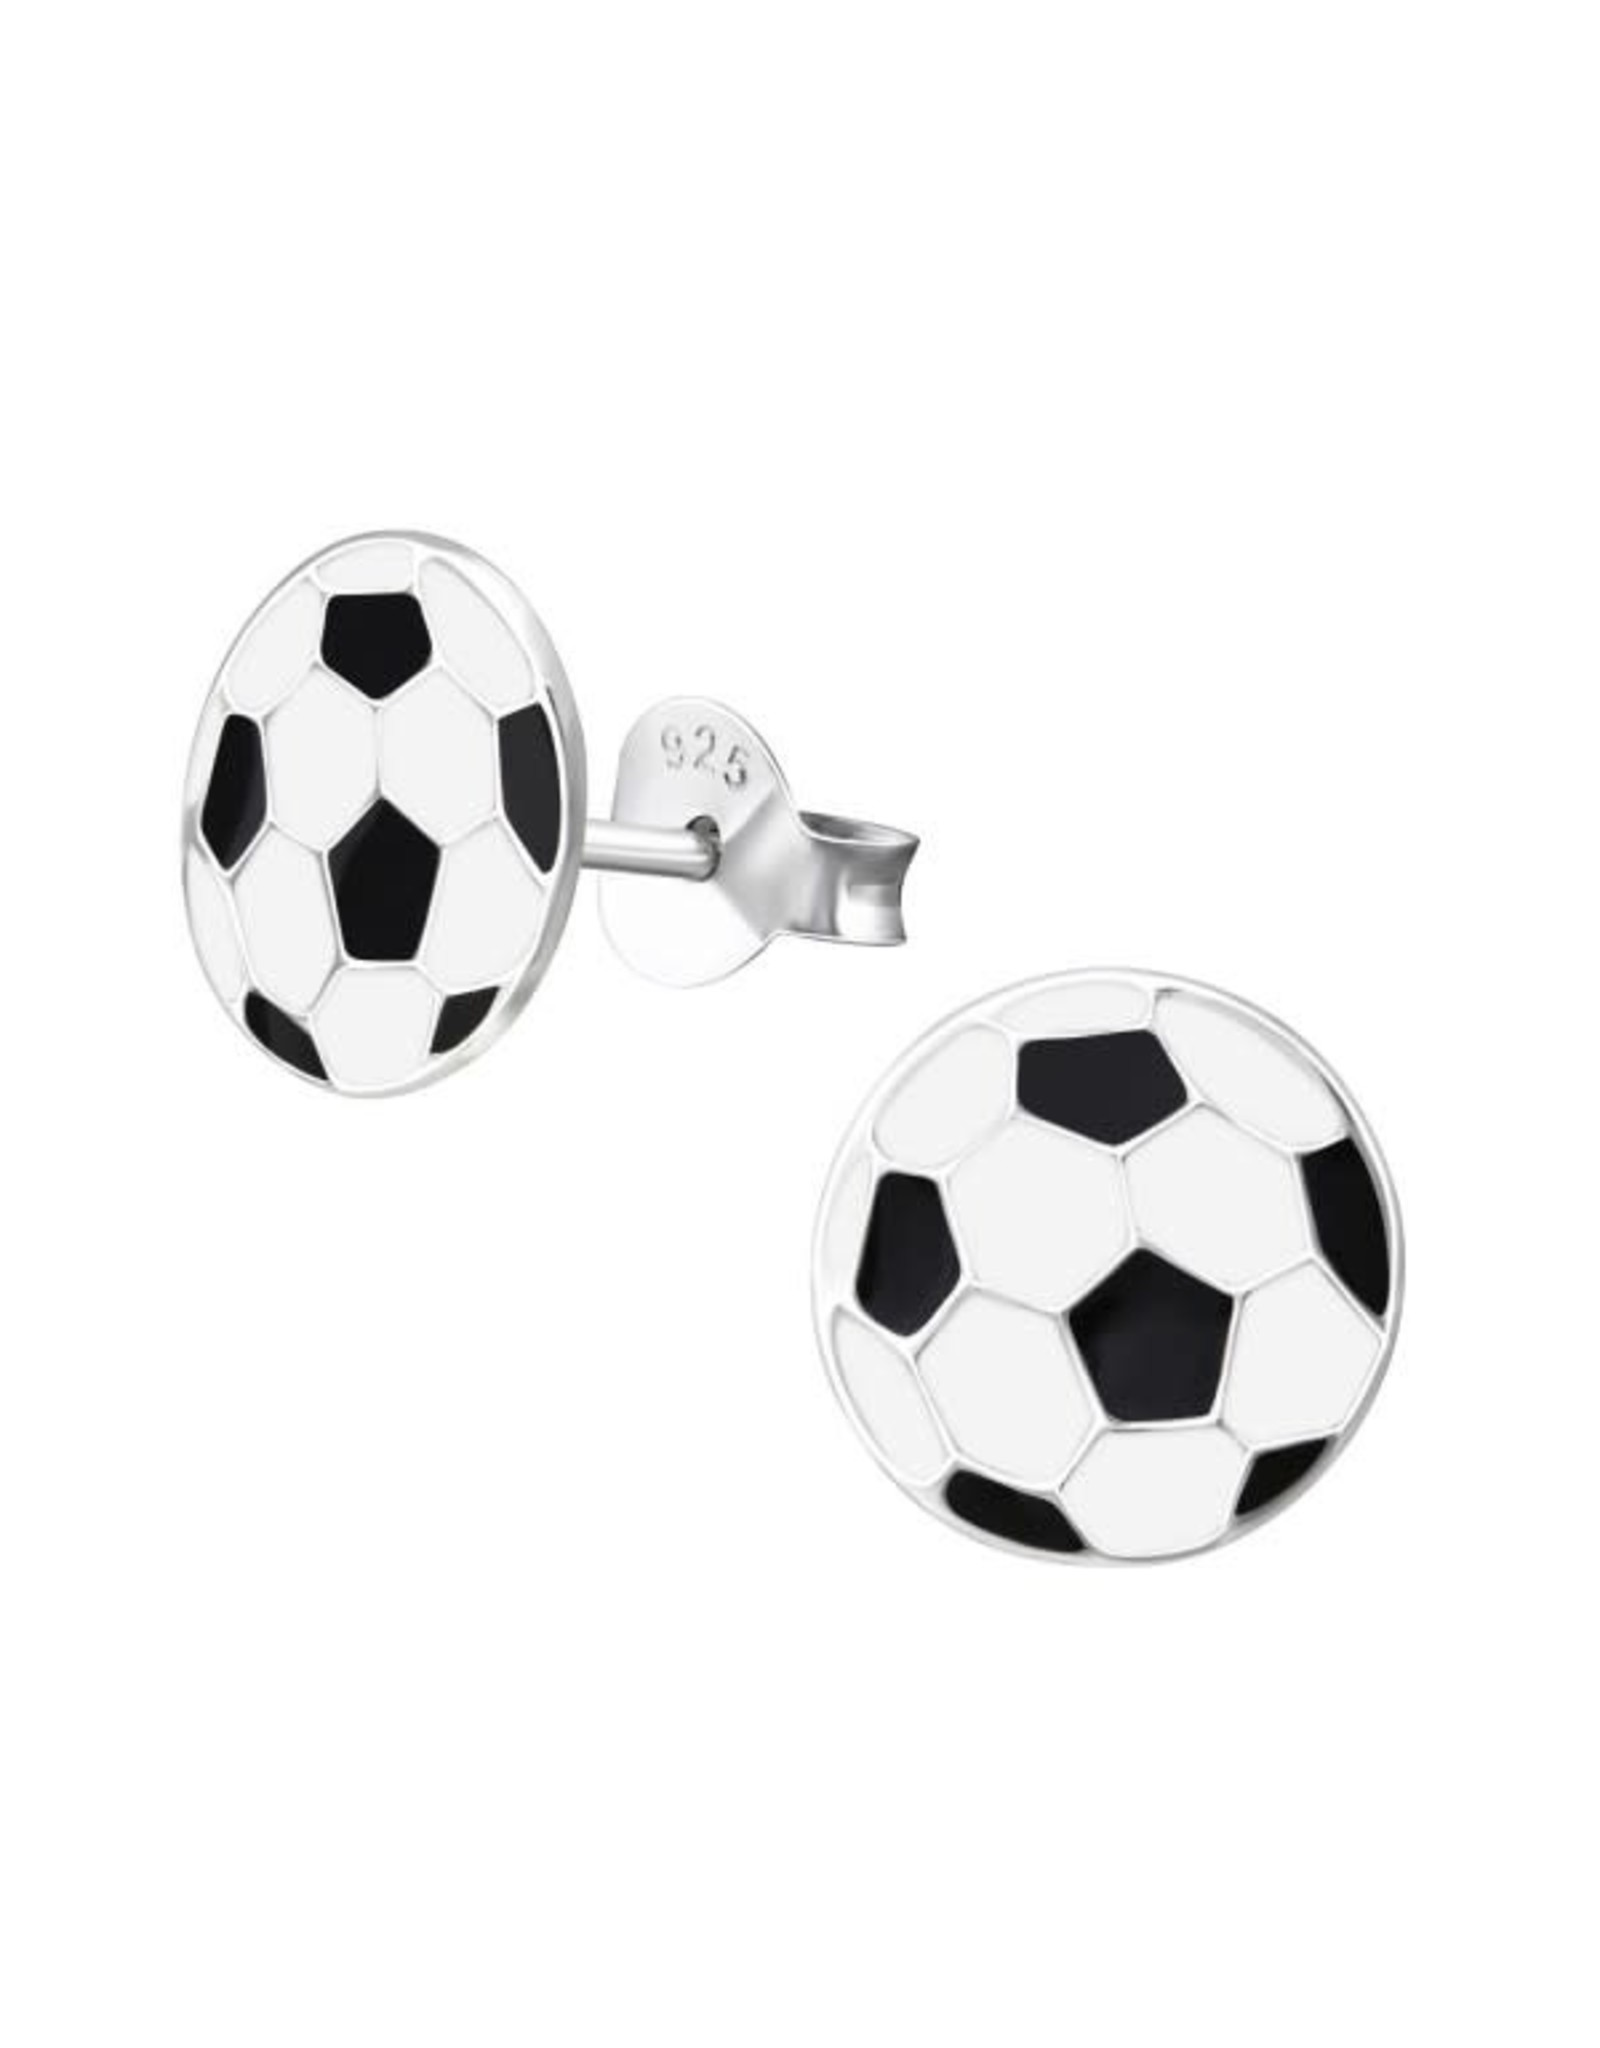 Stekertjes zilver voetbal